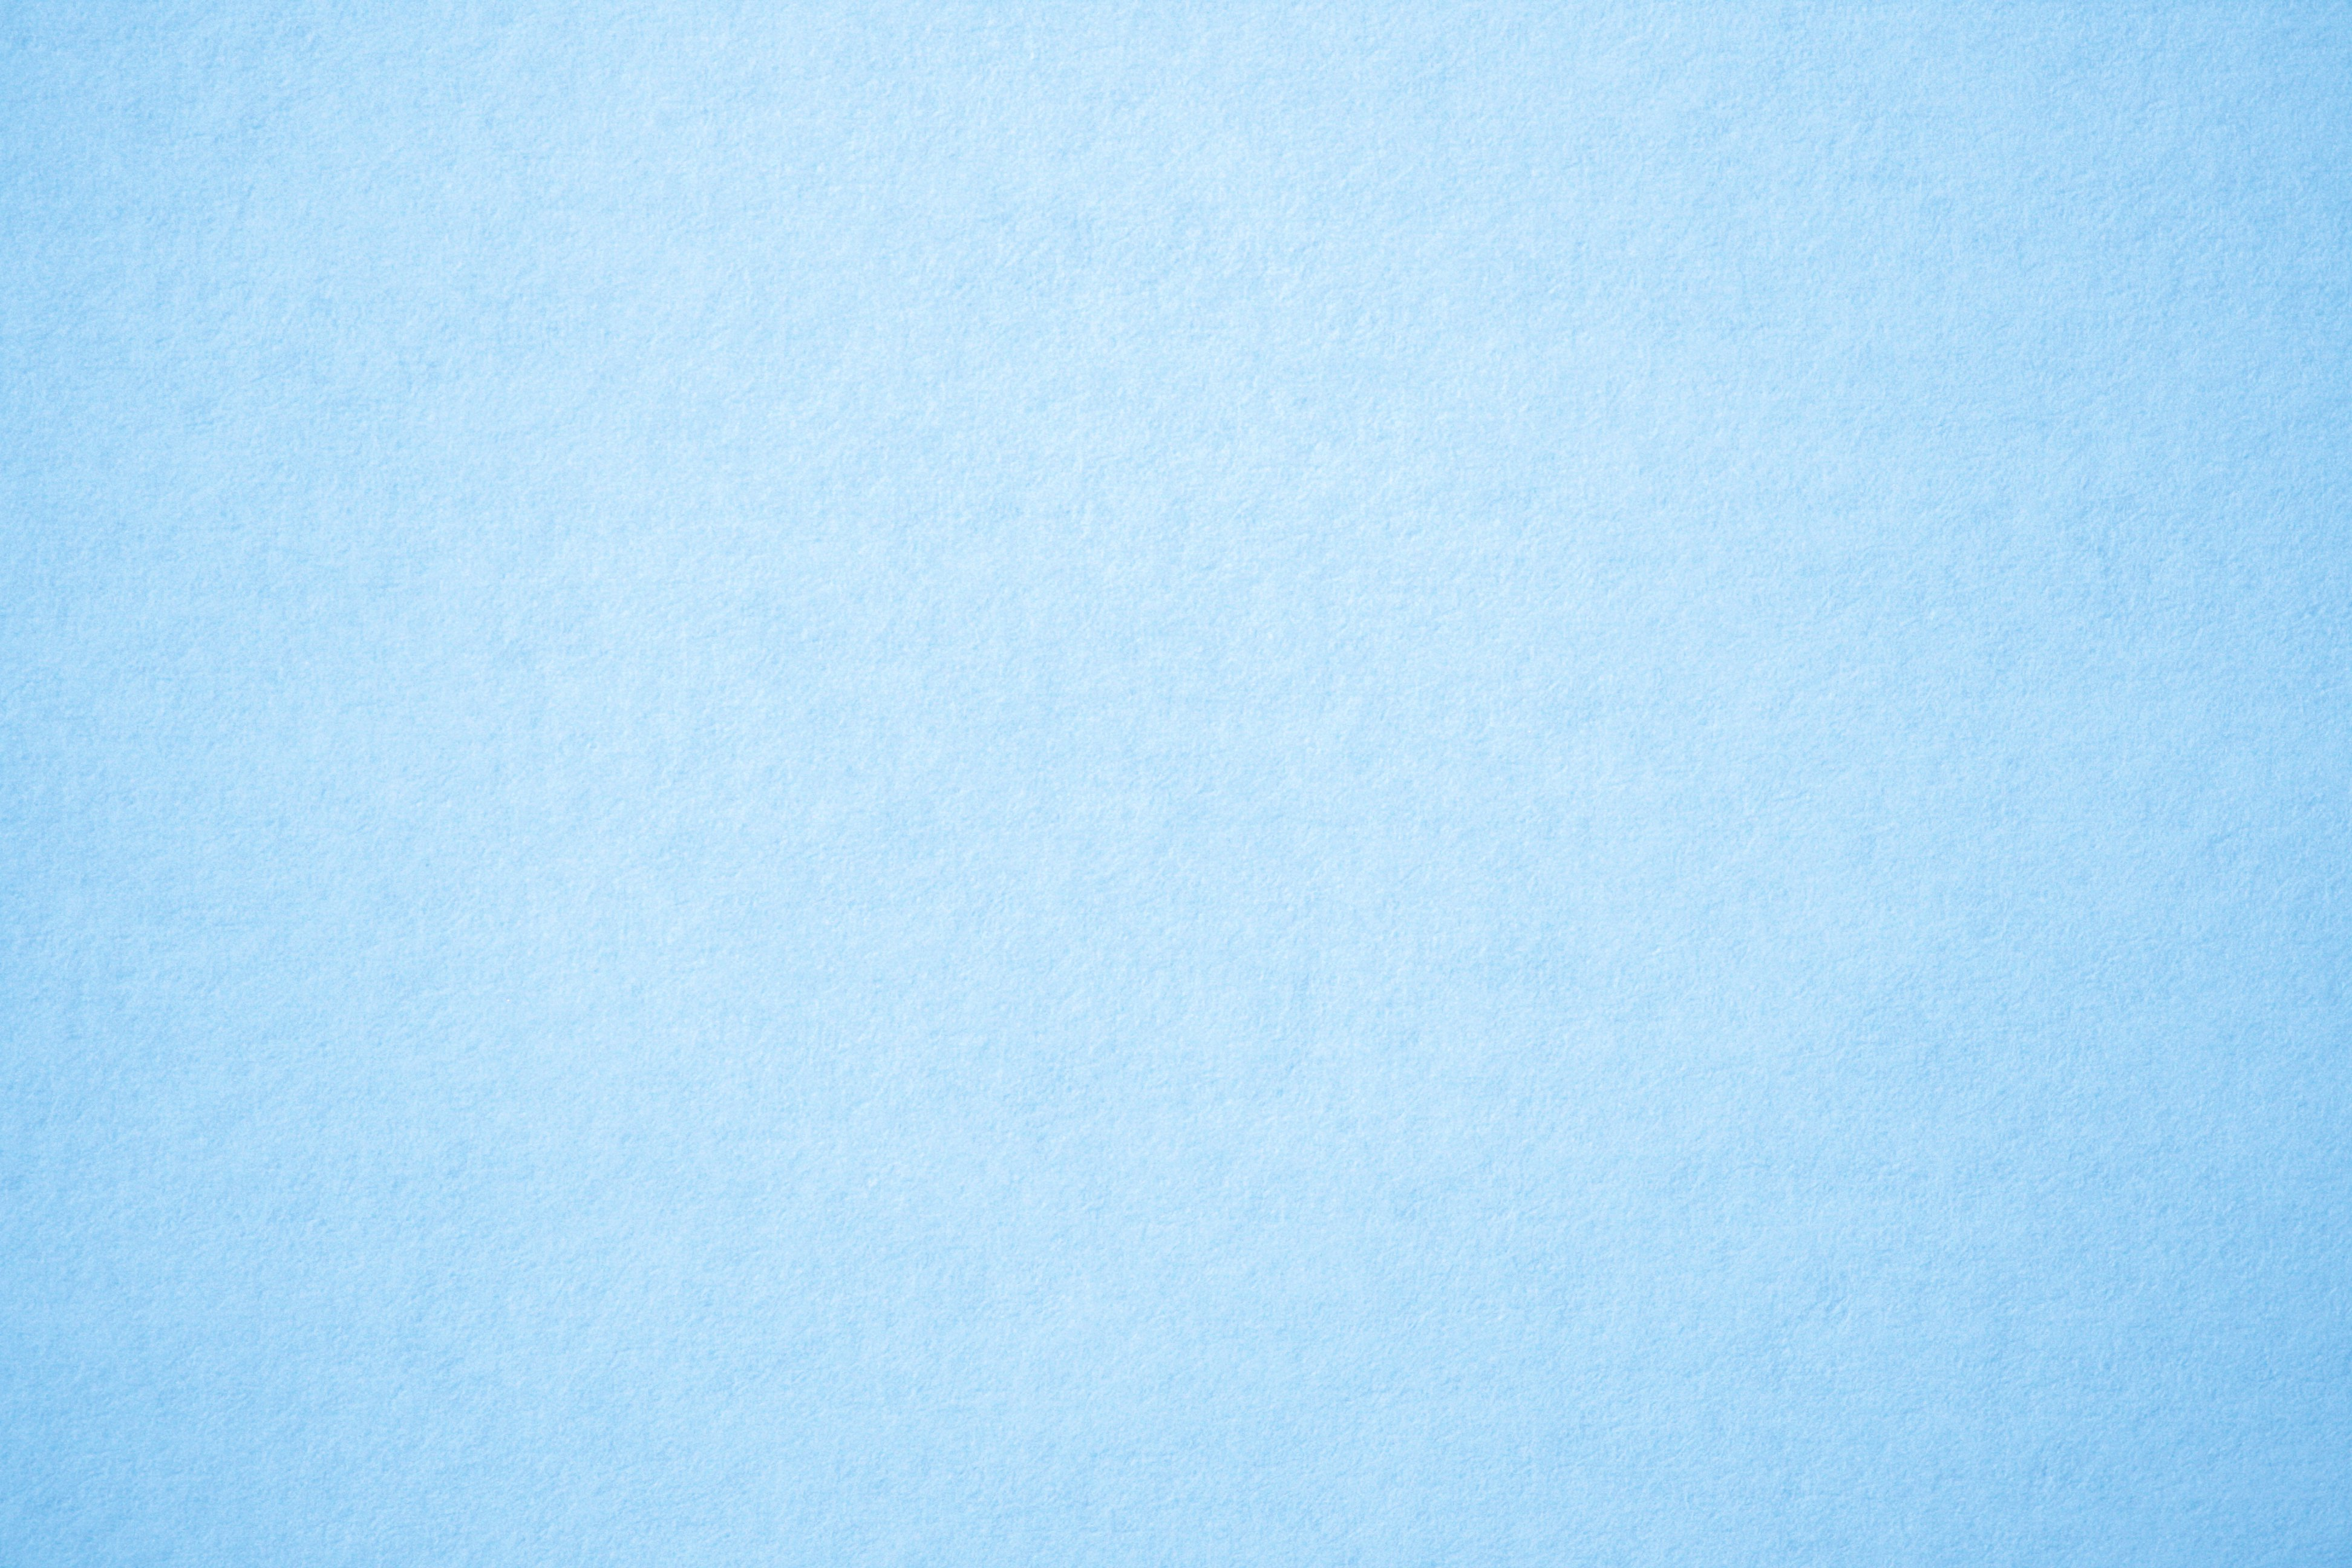 Baby blue wallpapers wallpapersafari for Baby blue wallpaper